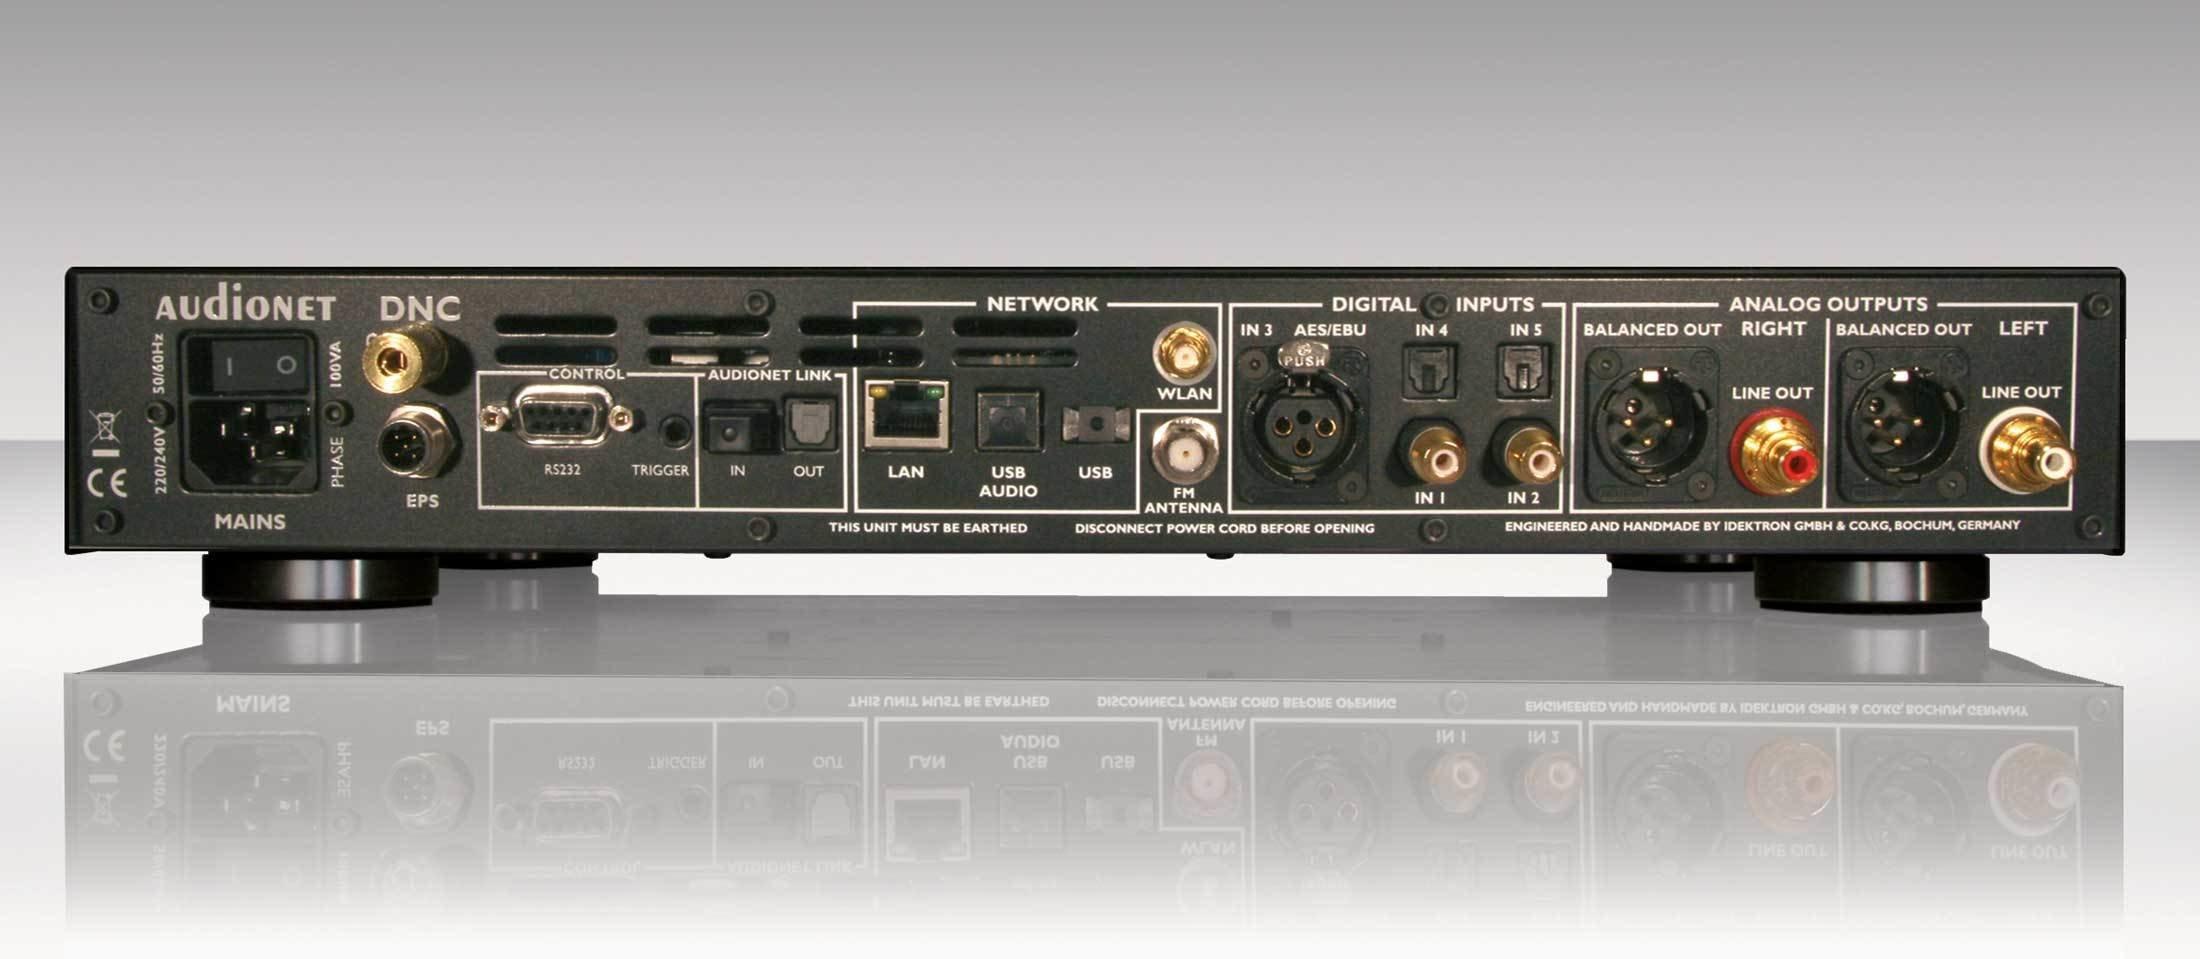 AudioNet DNC